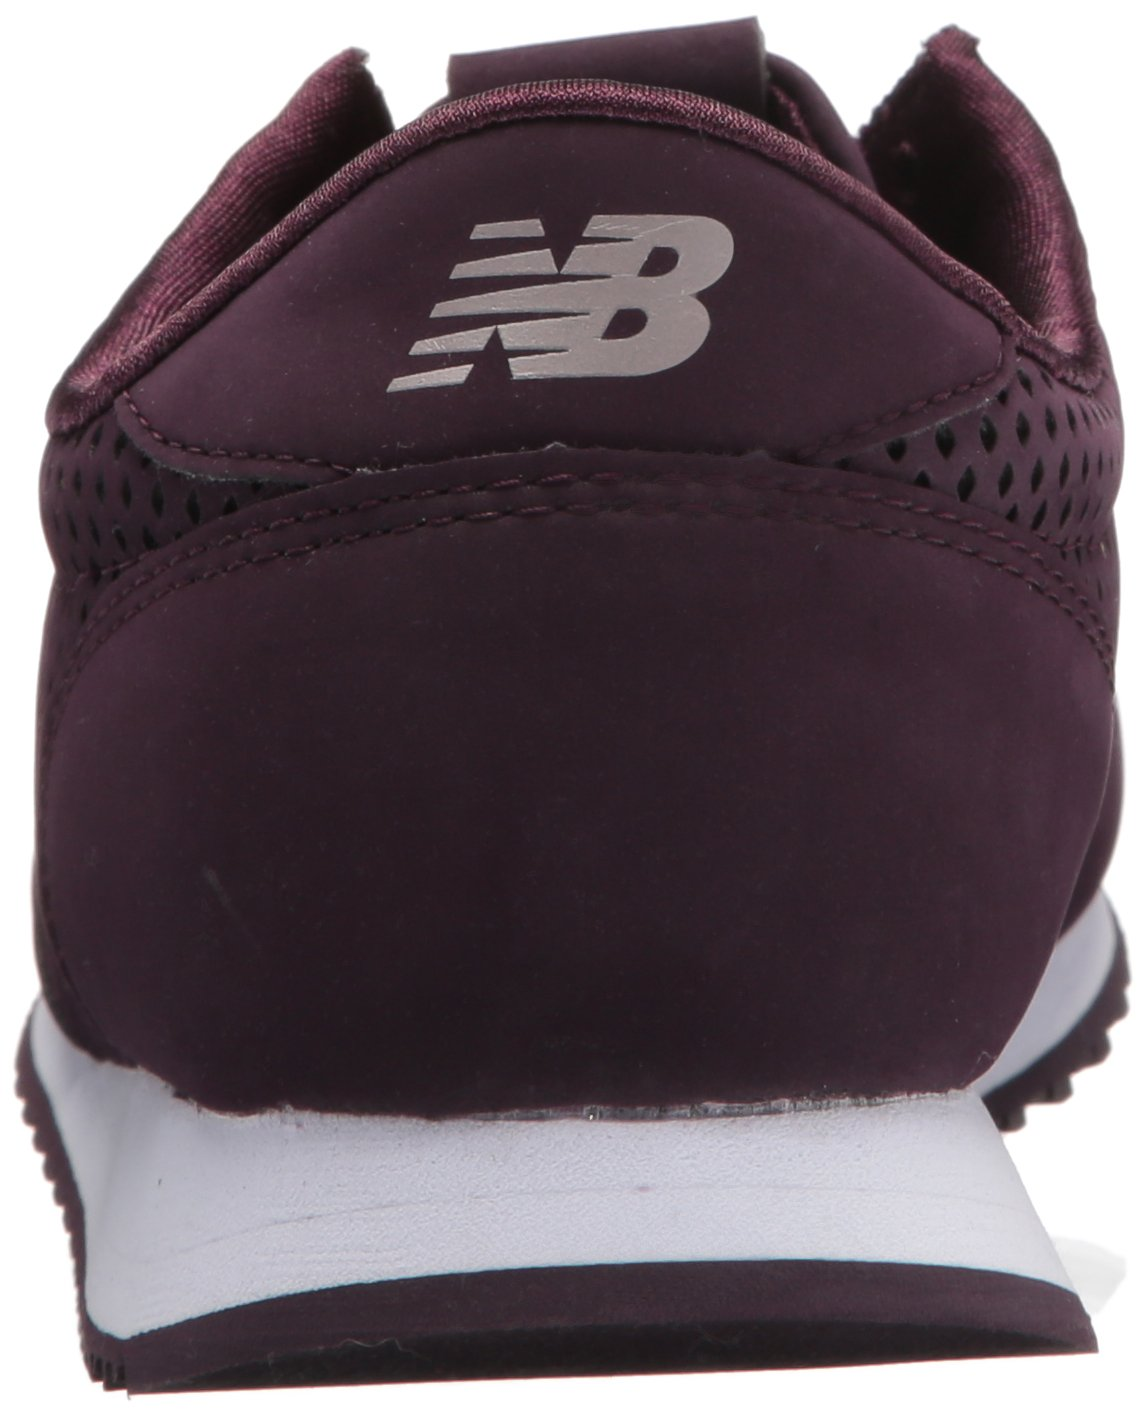 New Balance Women's 420v1 B(M) Lifestyle Sneaker B01MT2S91Z 10.5 B(M) 420v1 US|Black Rose/Champagen Metallic 221efd